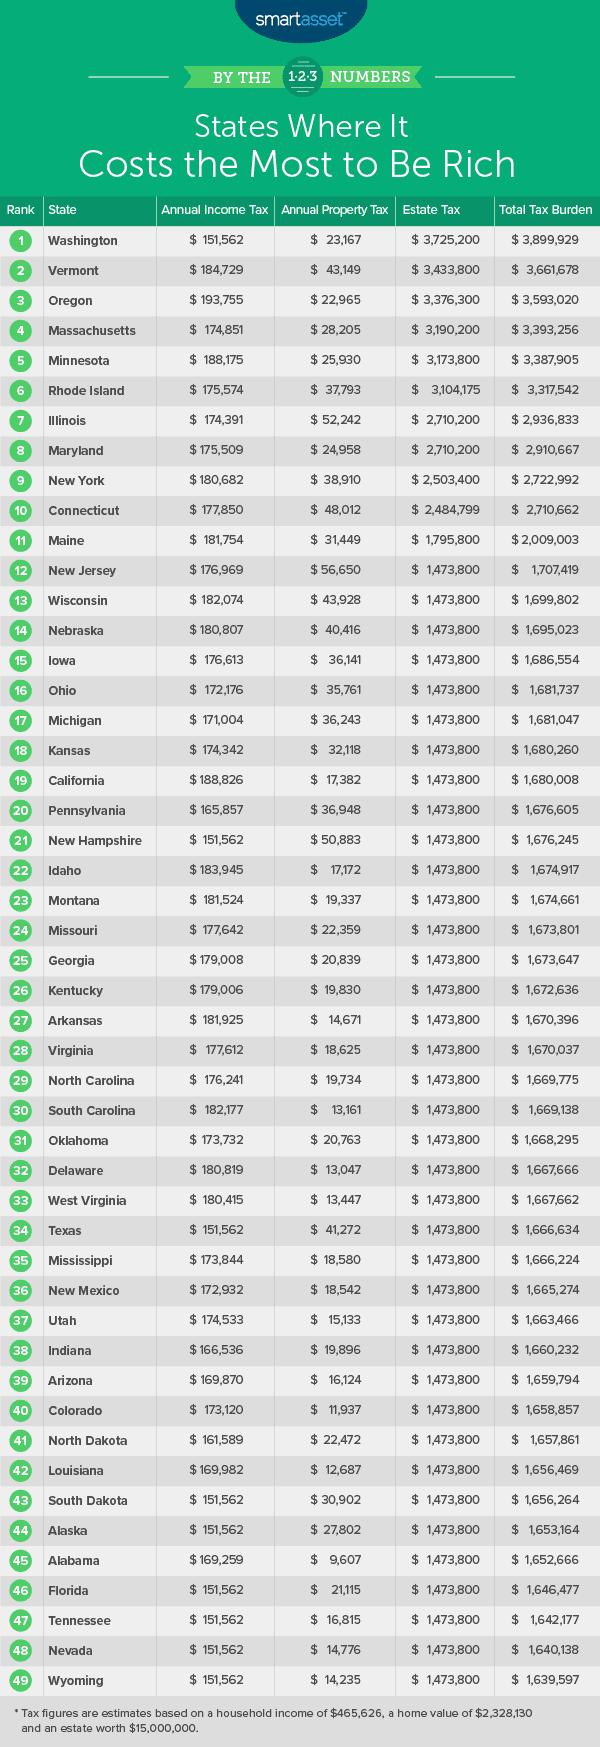 H/O: Rich states chart